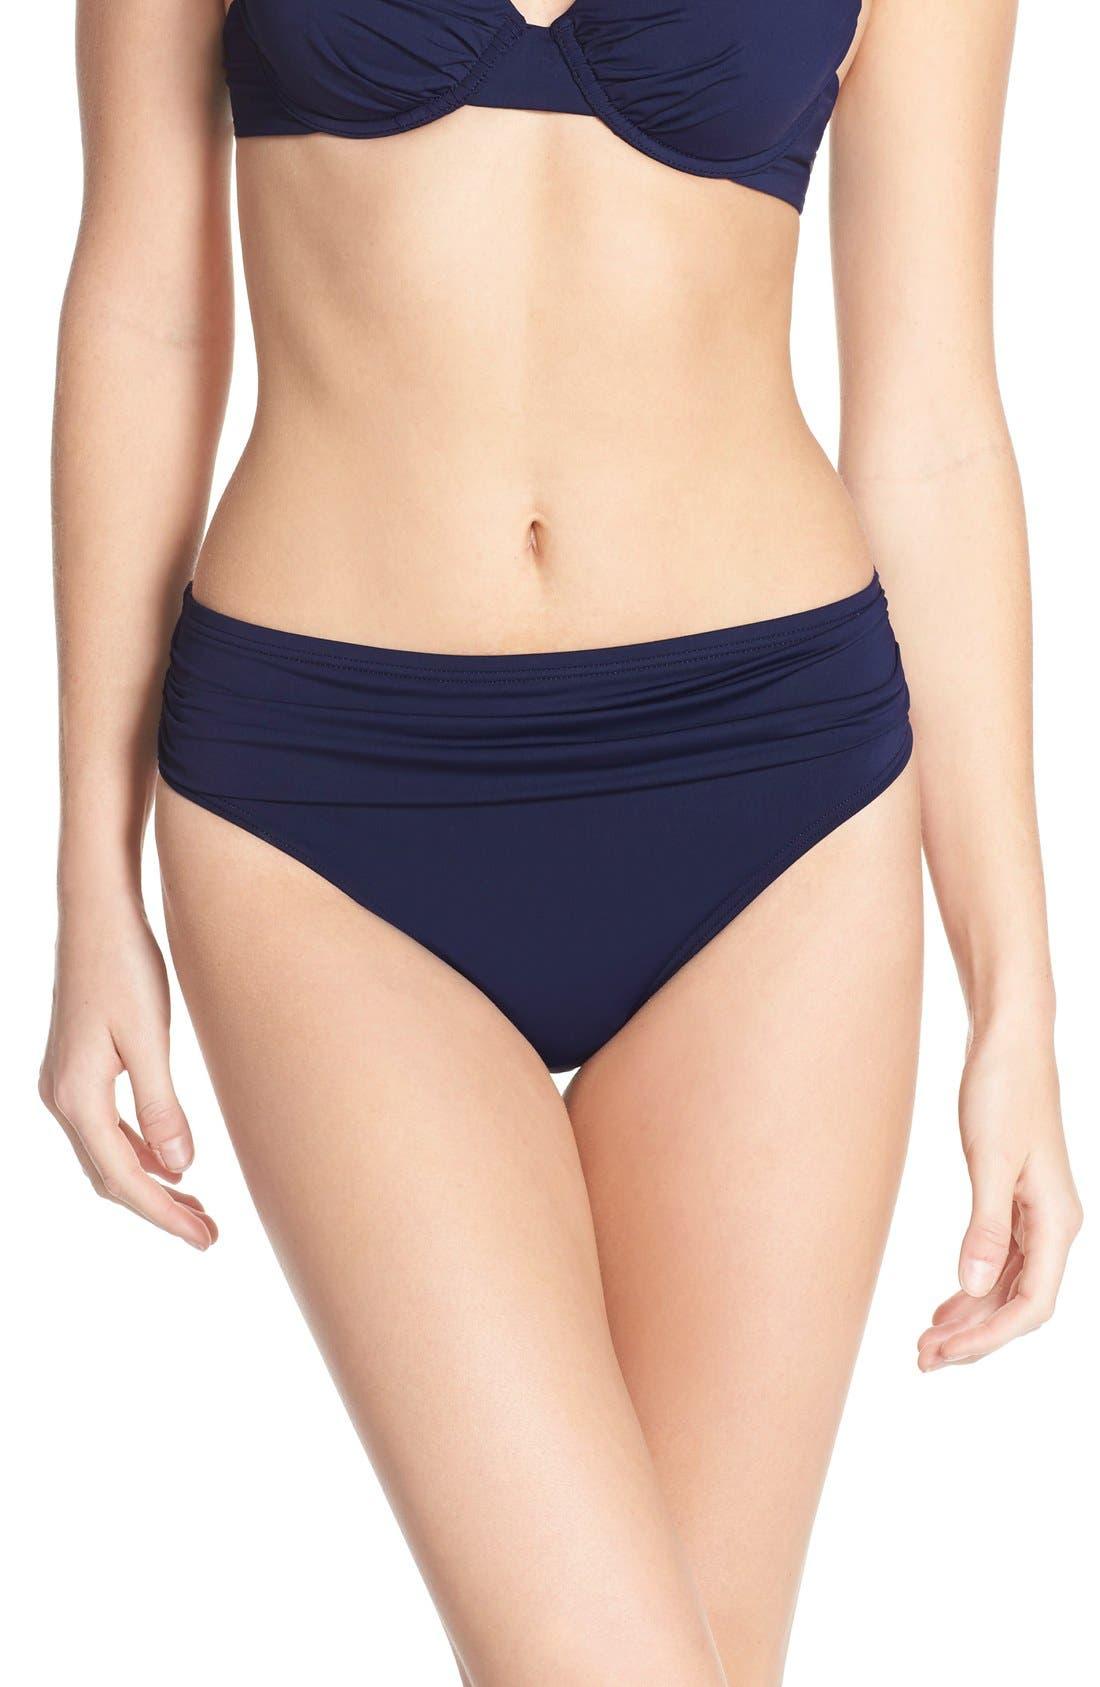 Alternate Image 1 Selected - Tommy Bahama 'Pearl' High Waist Bikini Bottoms